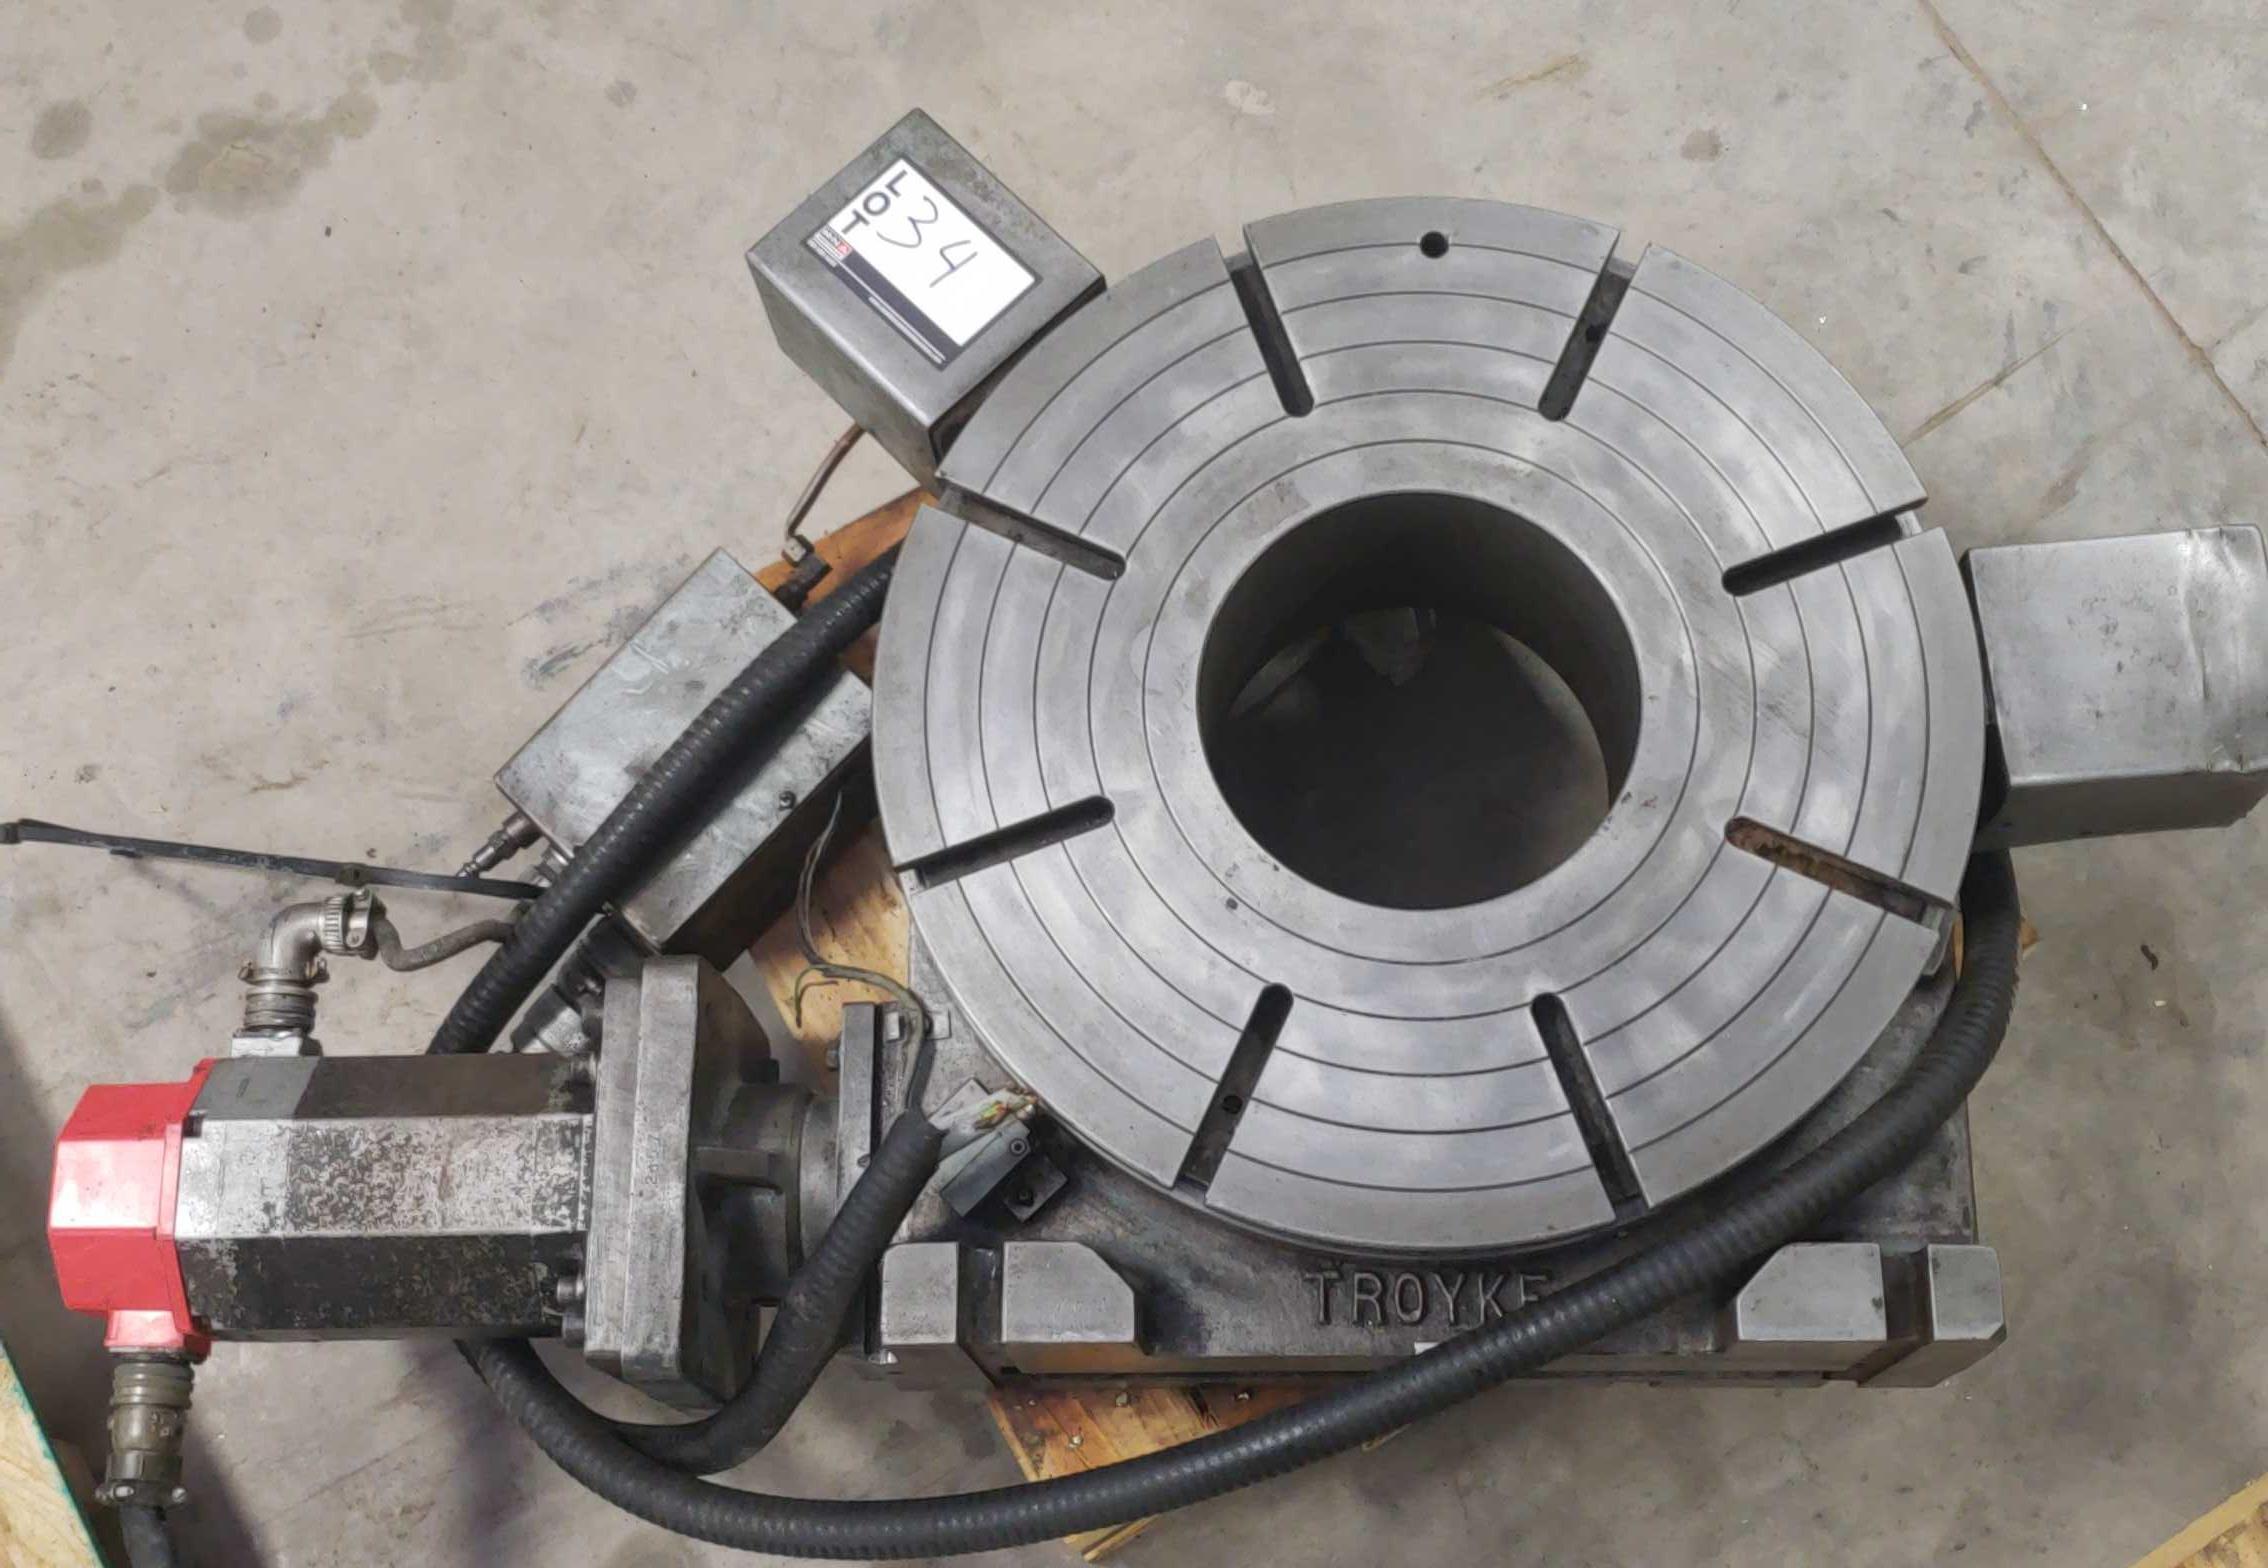 "Troyke Full 4th Axis w/Fanuc motor, model C20360C3 20"" Platten w/8"" hole thru SN: 3797-1"